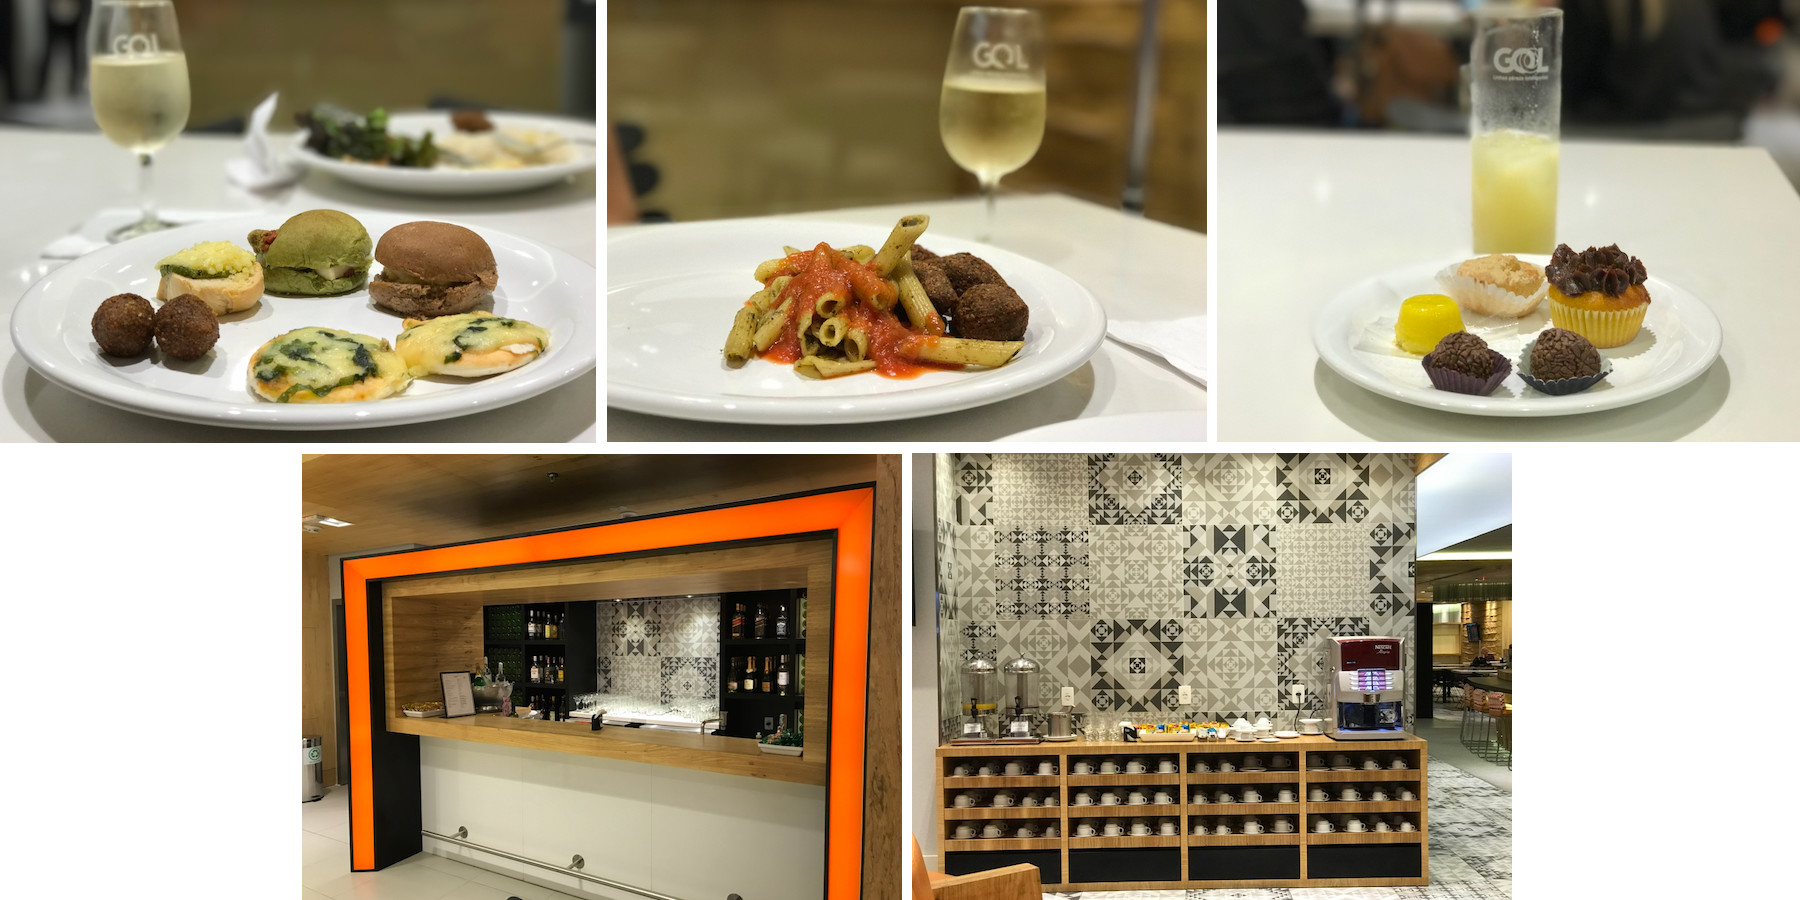 gol premium lounge comidas bar